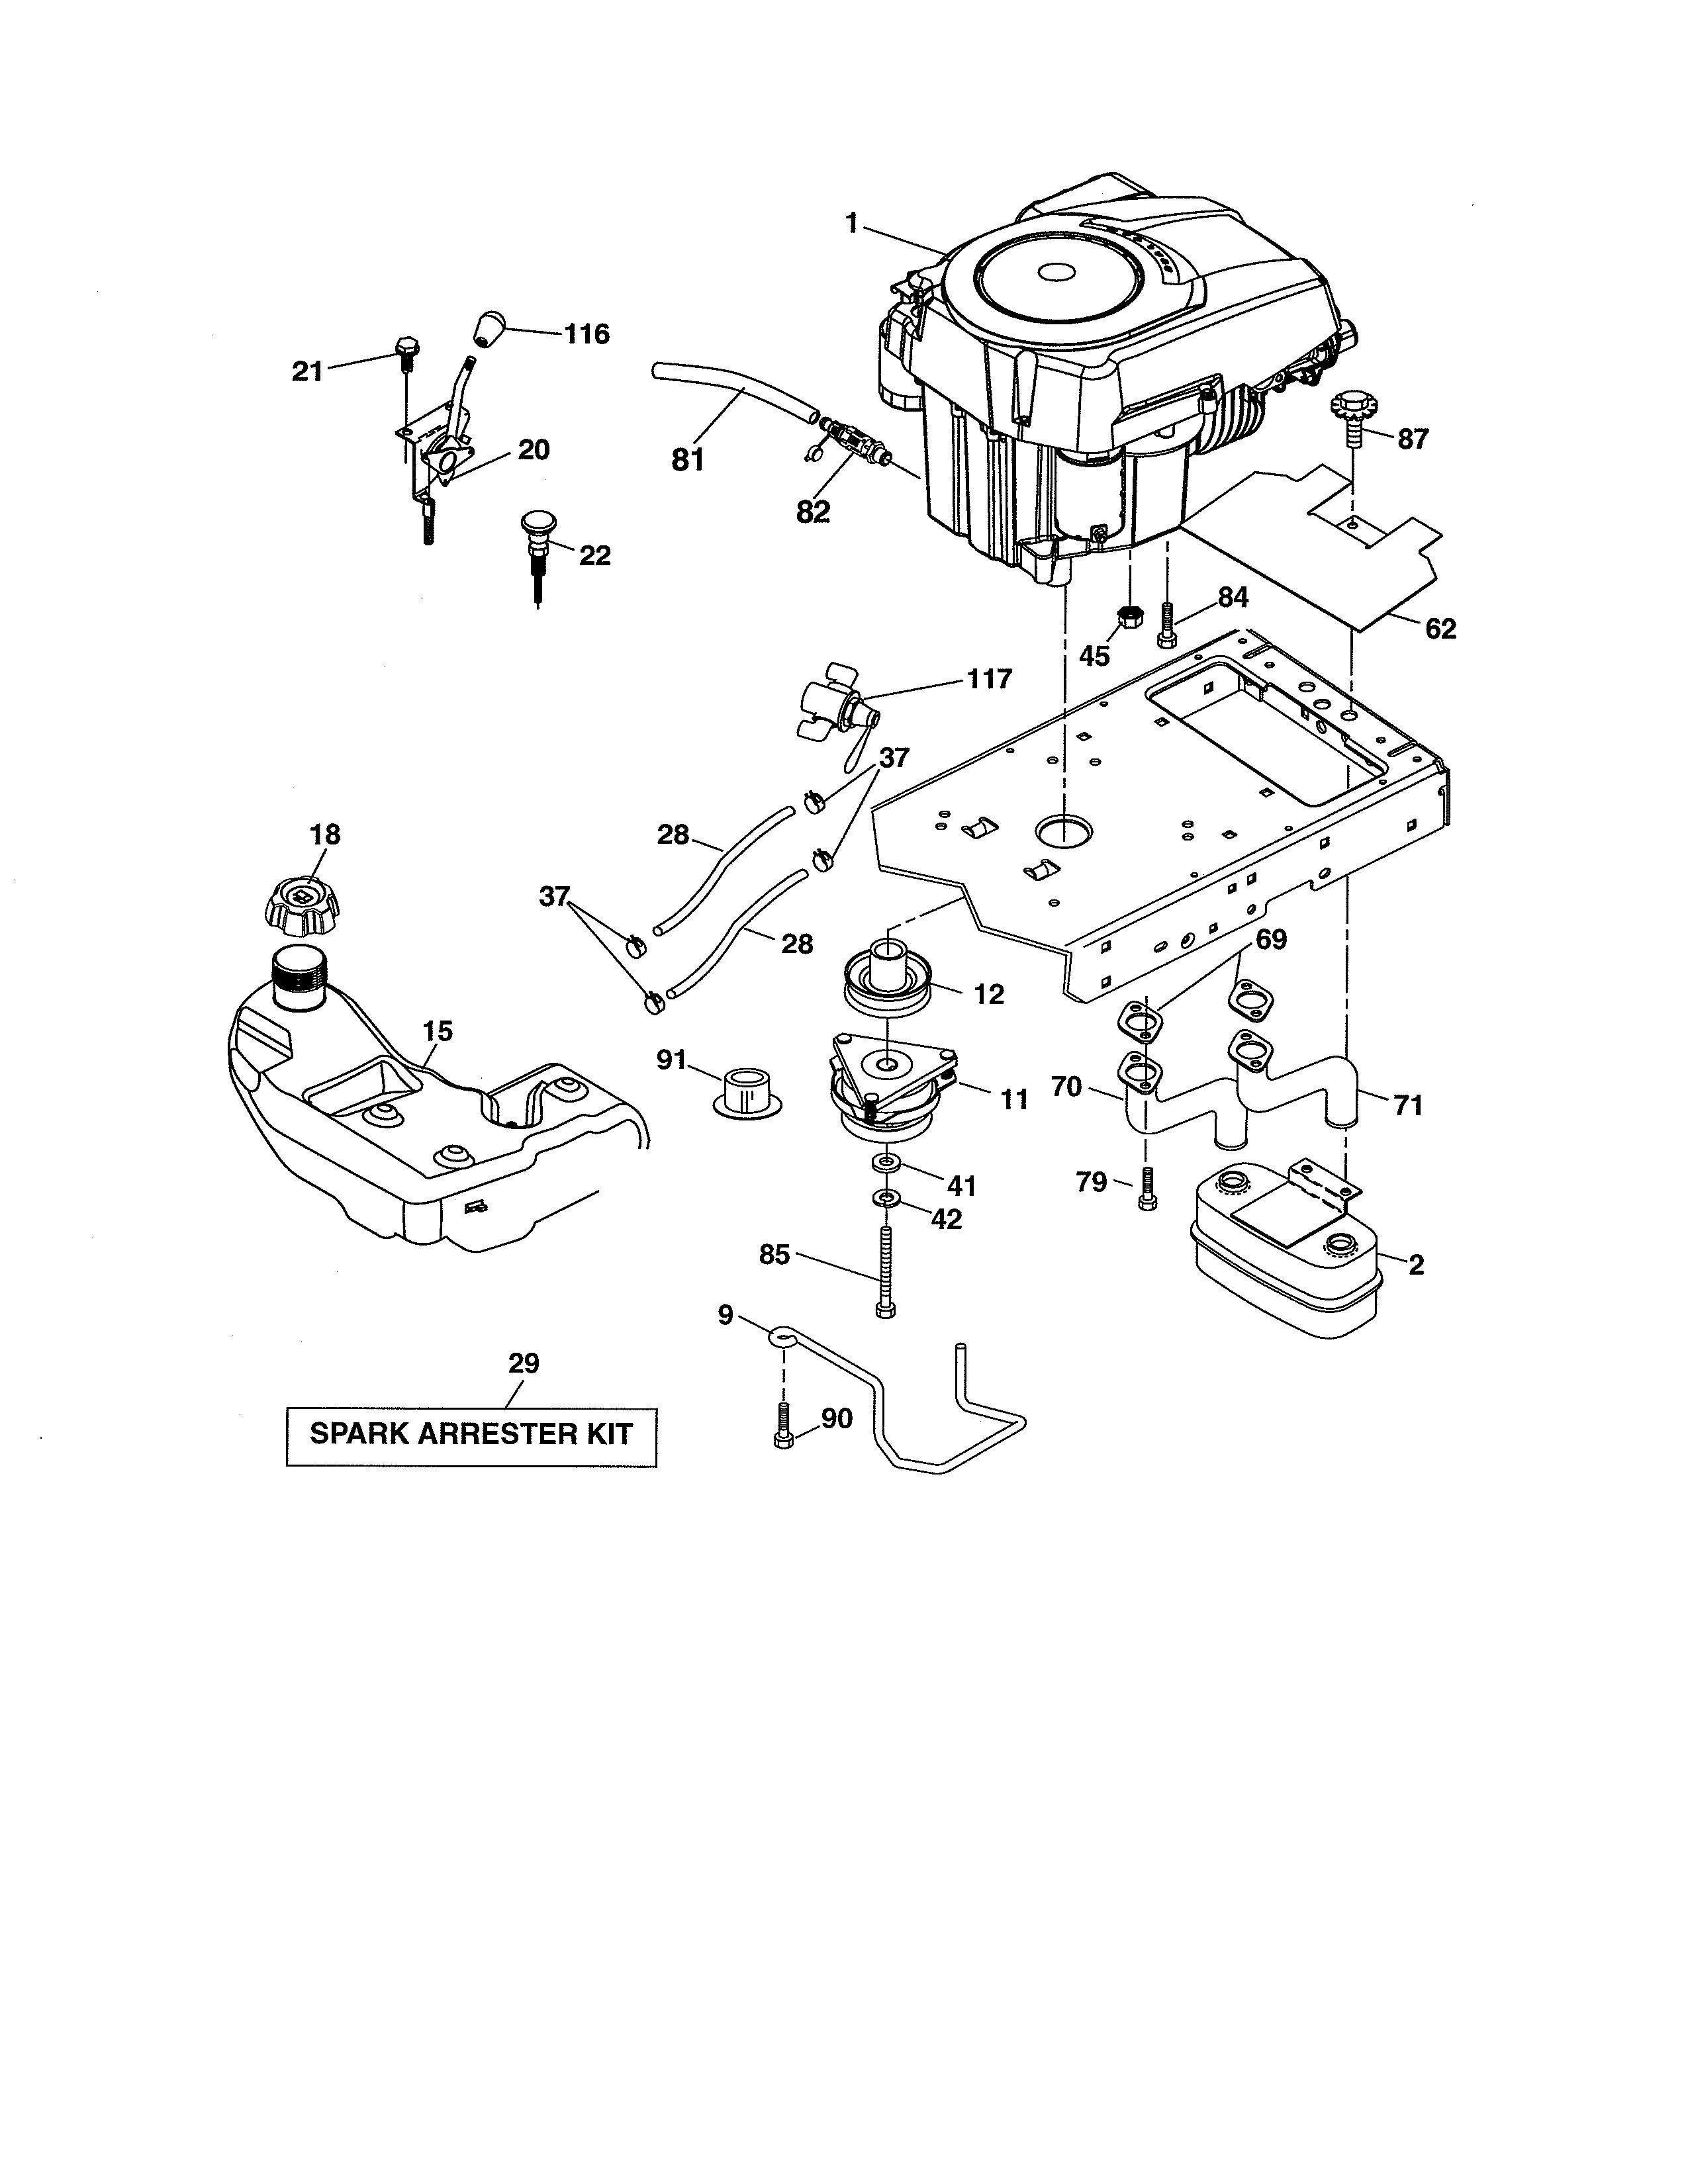 Craftsman Riding Mower Engine Diagram Craftsman Model Lawn Tractor Genuine Parts Of Craftsman Riding Mower Engine Diagram